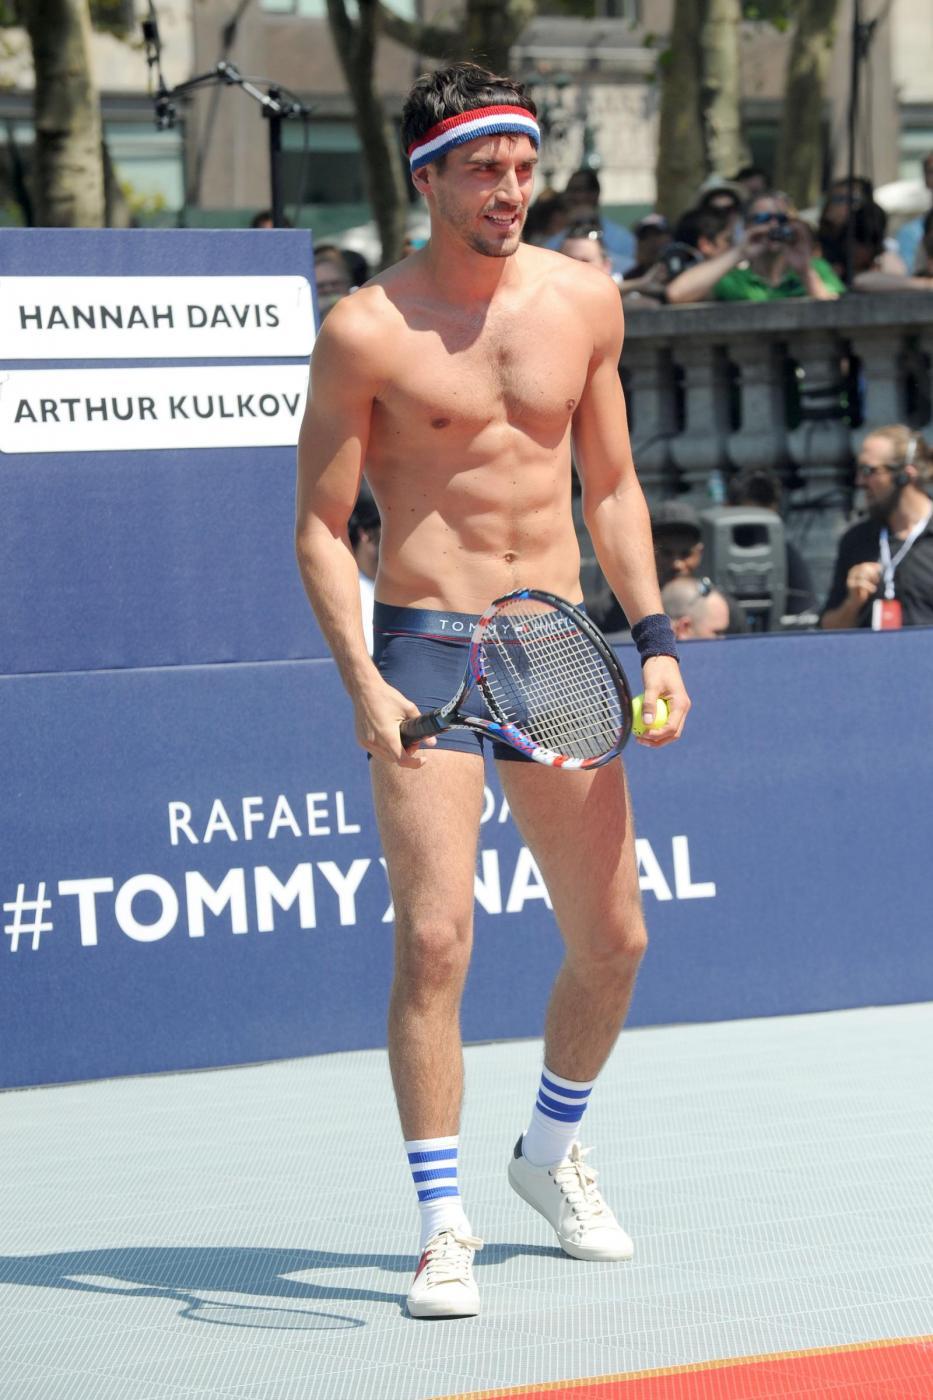 Rafael Nadal in mutande per Tommy Hilfiger VIDEO 7